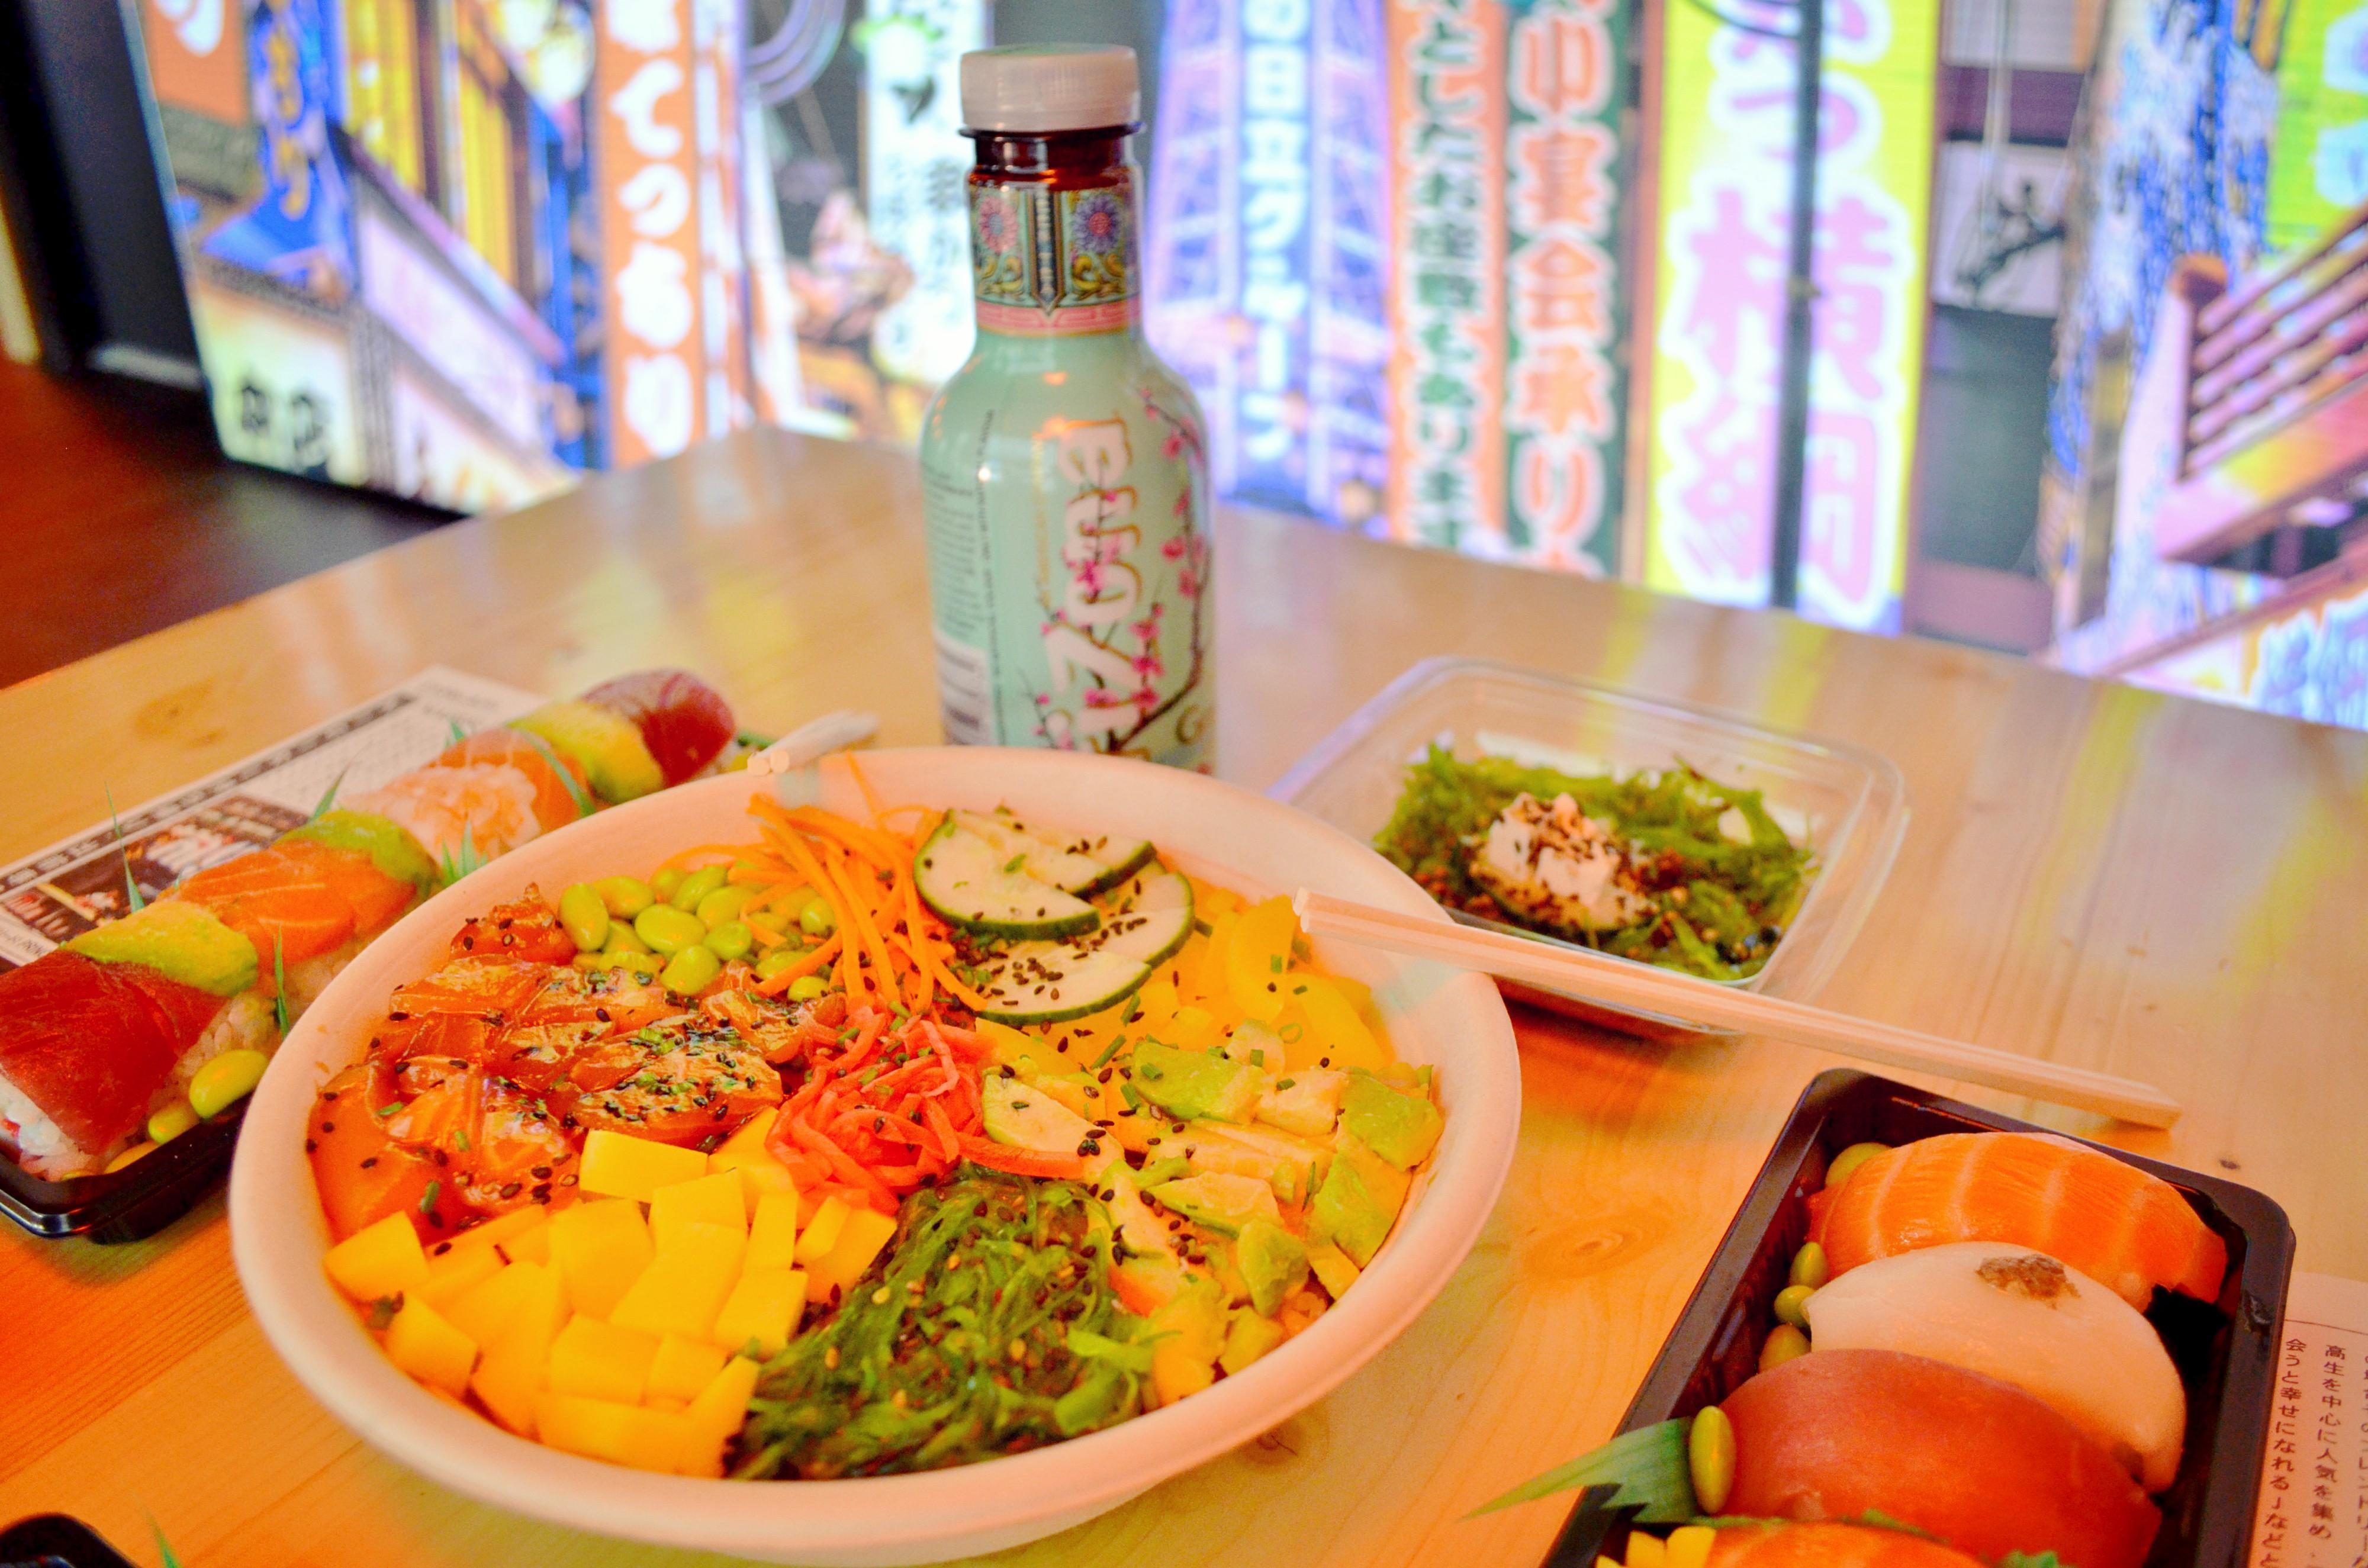 Sushi-lover-nigiri-madrid-blog-de-moda-ChicAdicta-fashionista-Chic-Adicta-poke-bowl-comida-japonesa-PiensaenChic-Piensa-en-Chic